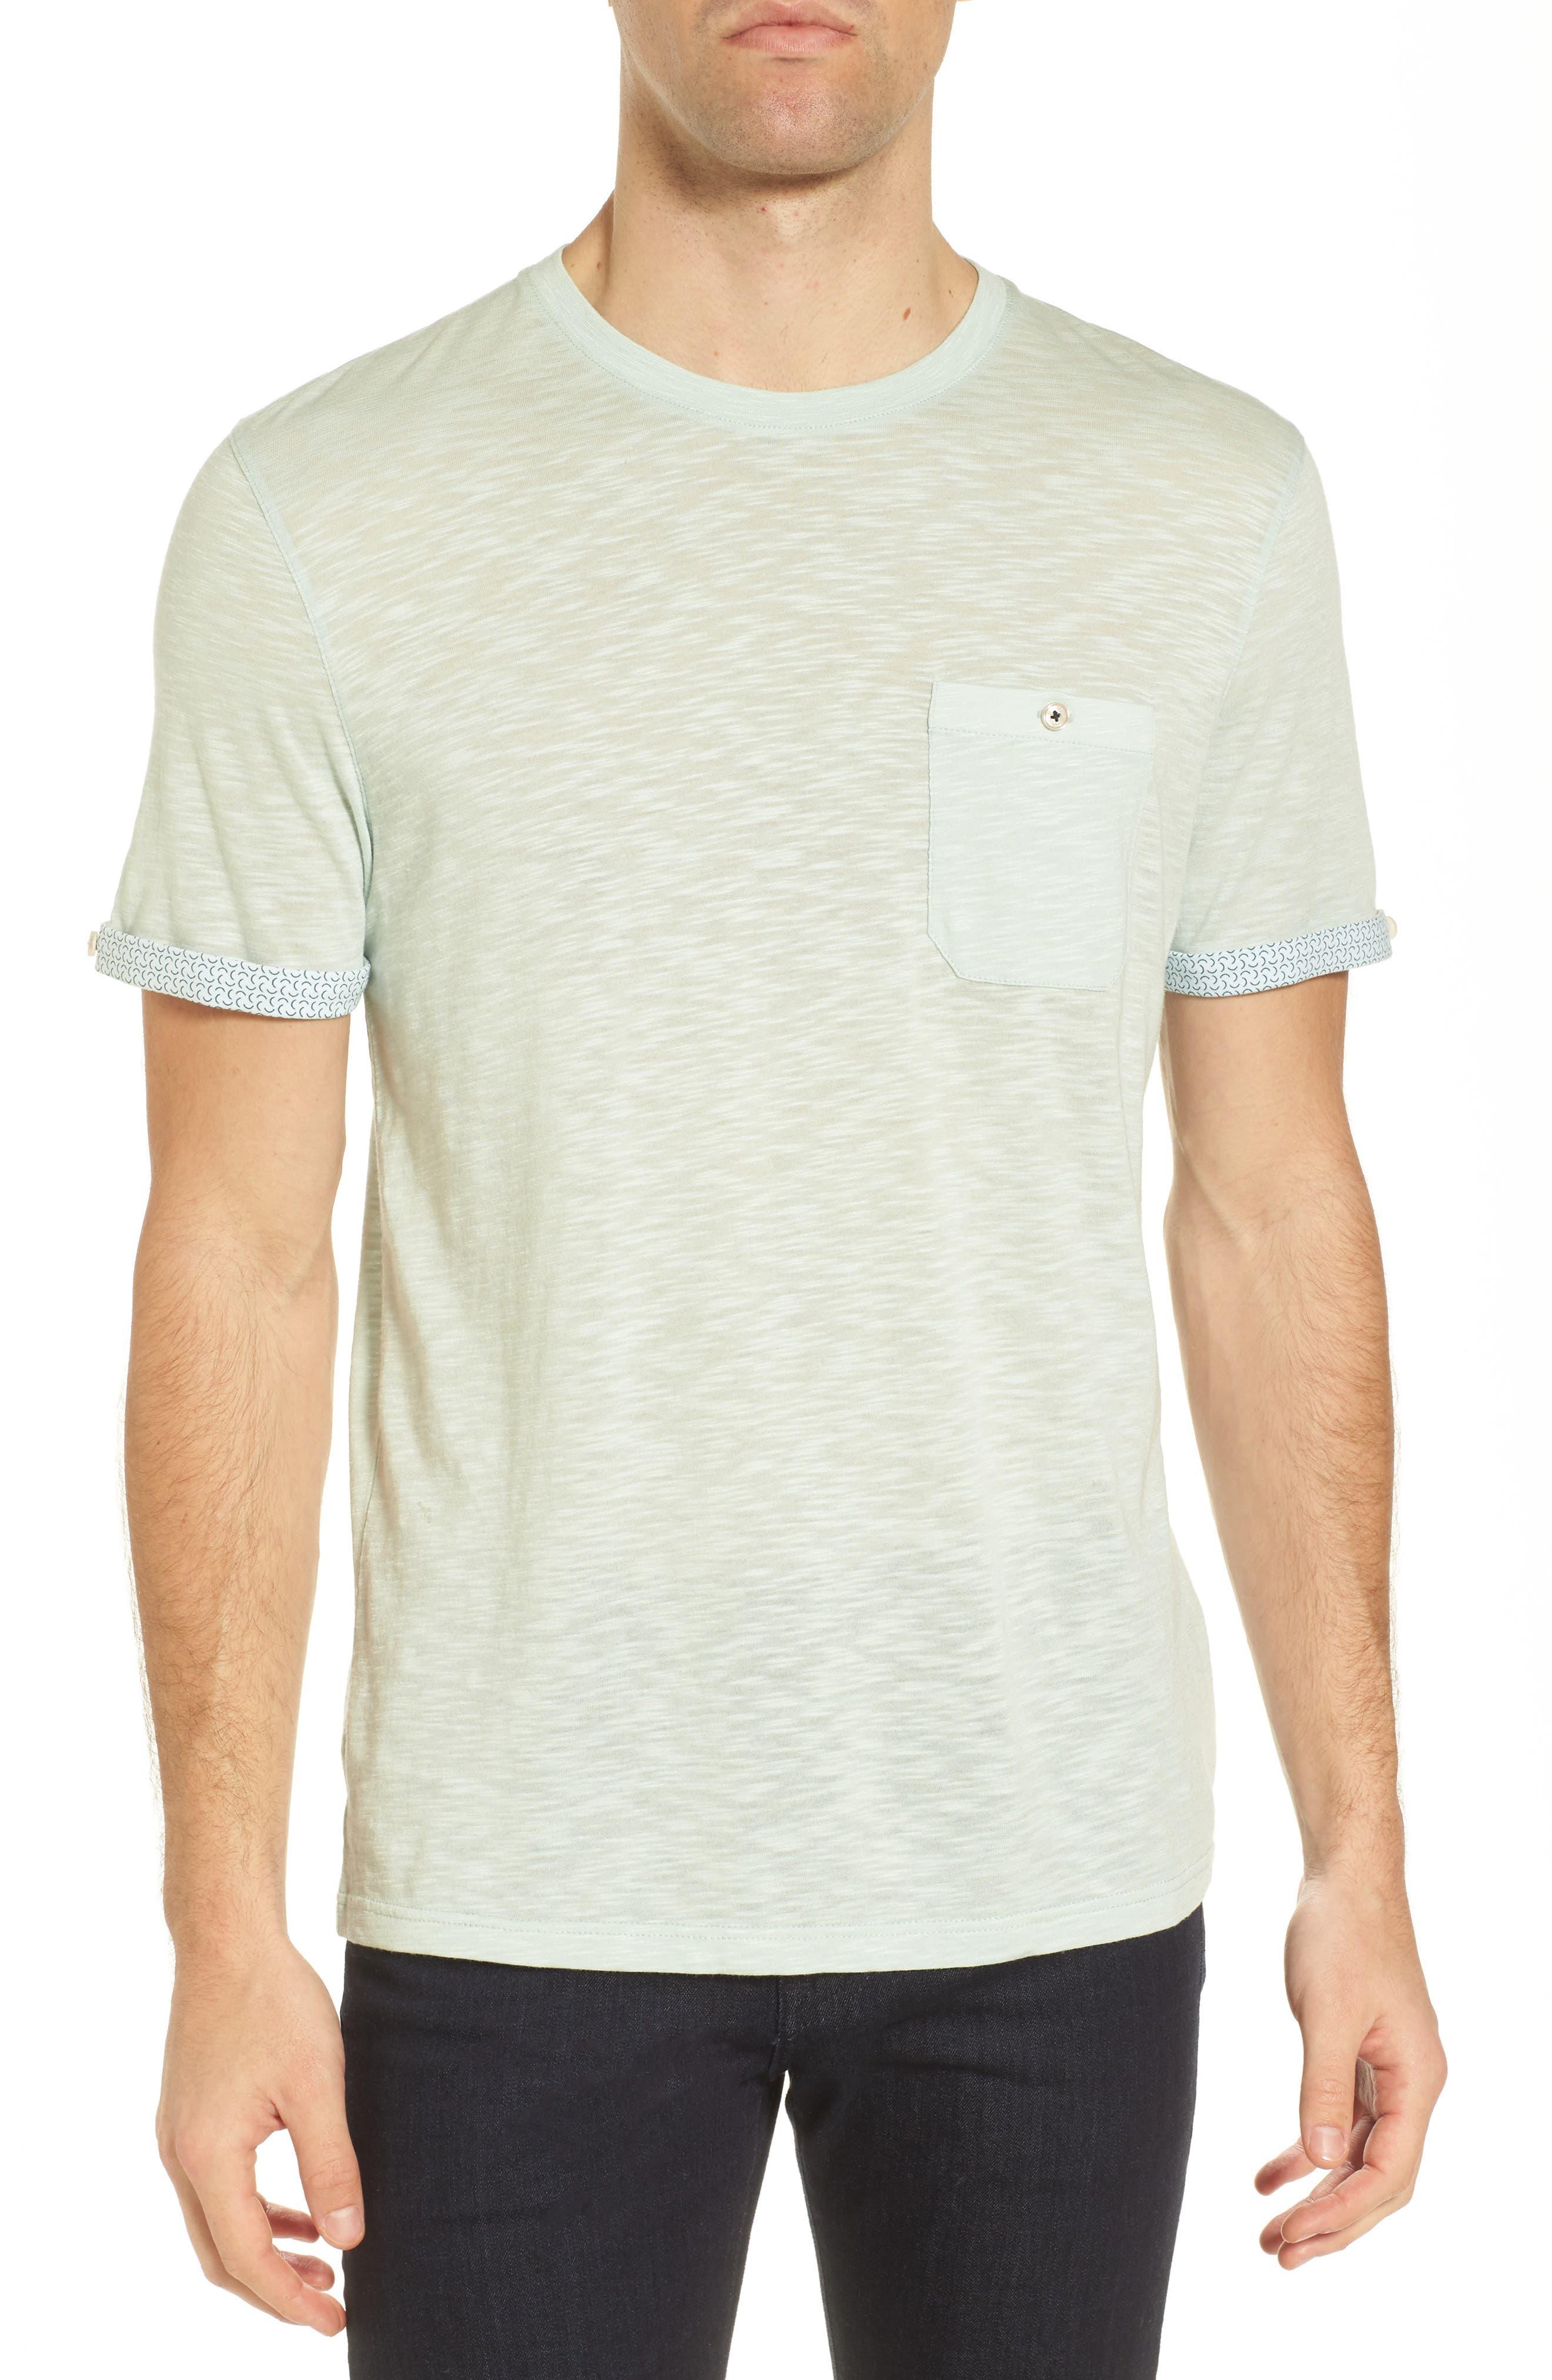 Main Image - Ted Baker London Taxi Slub Cotton Pocket T-Shirt